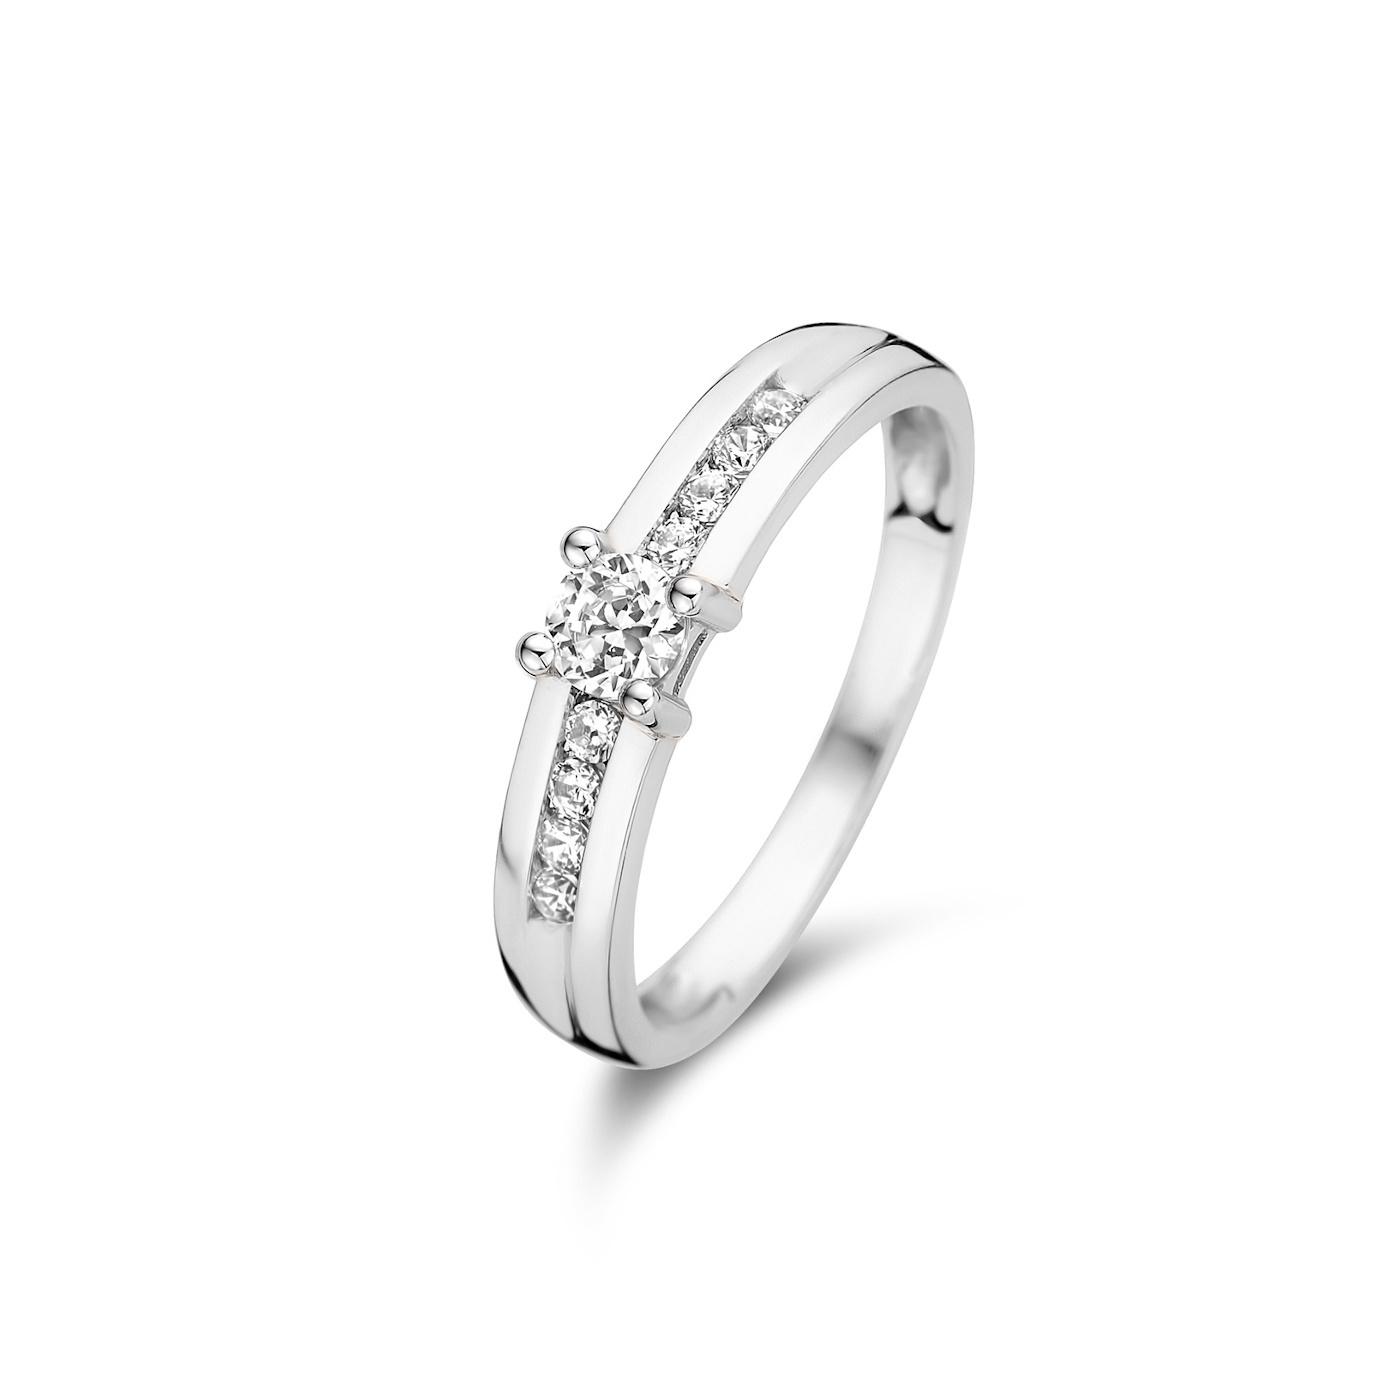 Isabel Bernard Saint Germain de Rennes 14 carat white gold ring zirconia